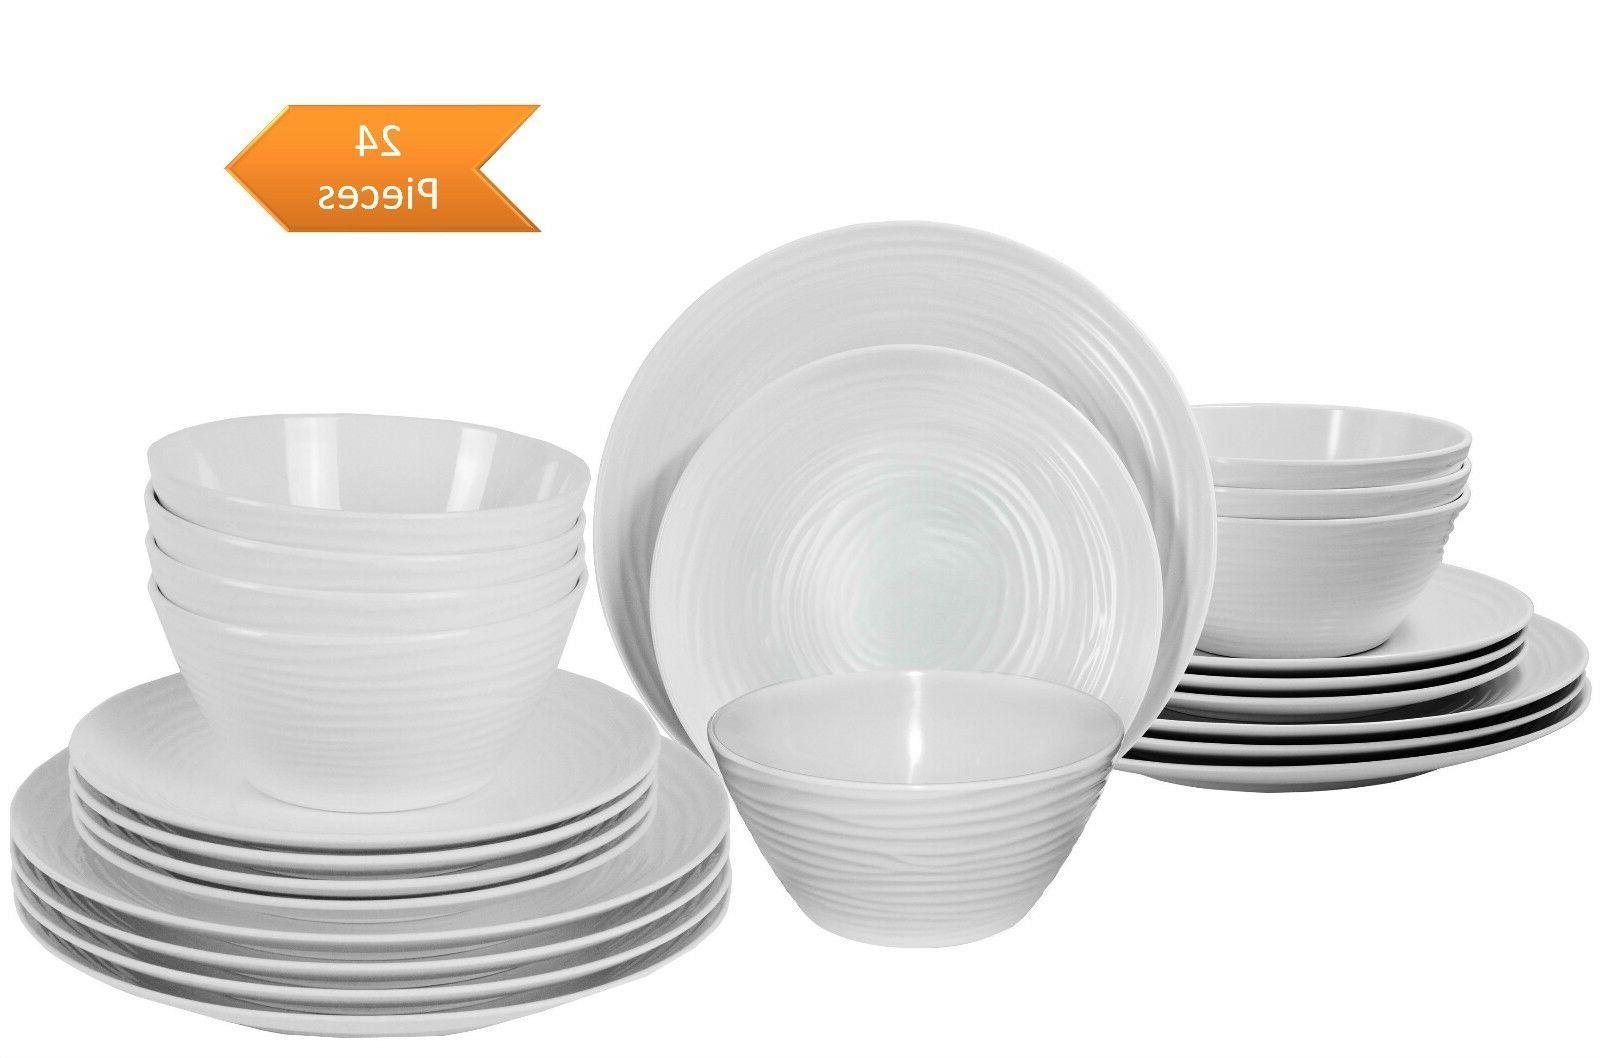 parhoma 24 piece modern white melamine dinnerware